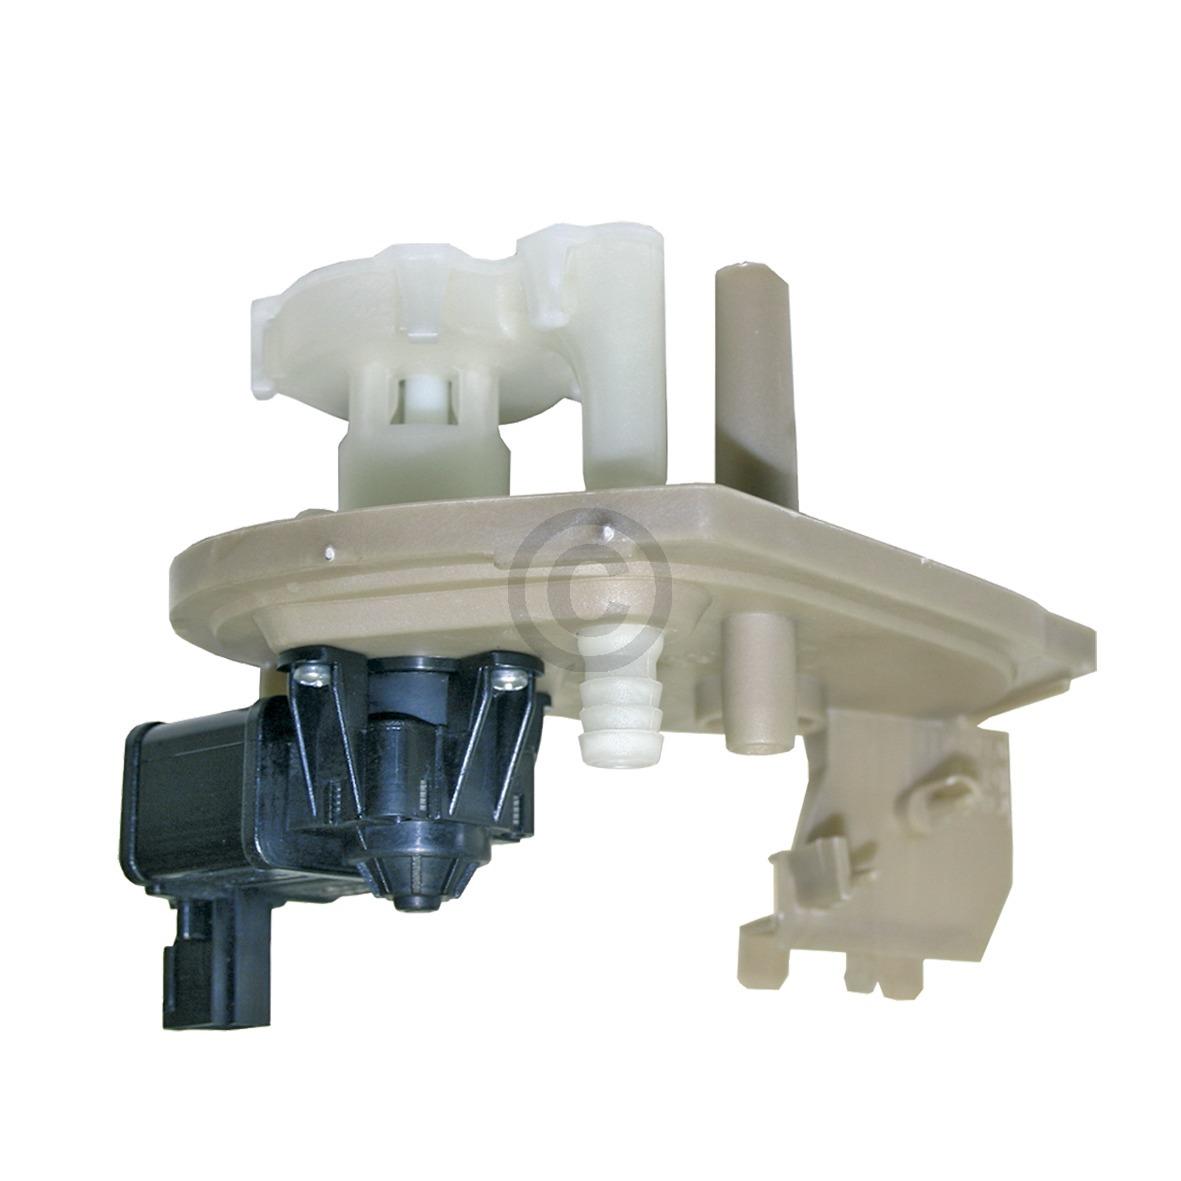 Kondenswasserpumpe 481236058212 Bauknecht, Whirlpool, Ikea